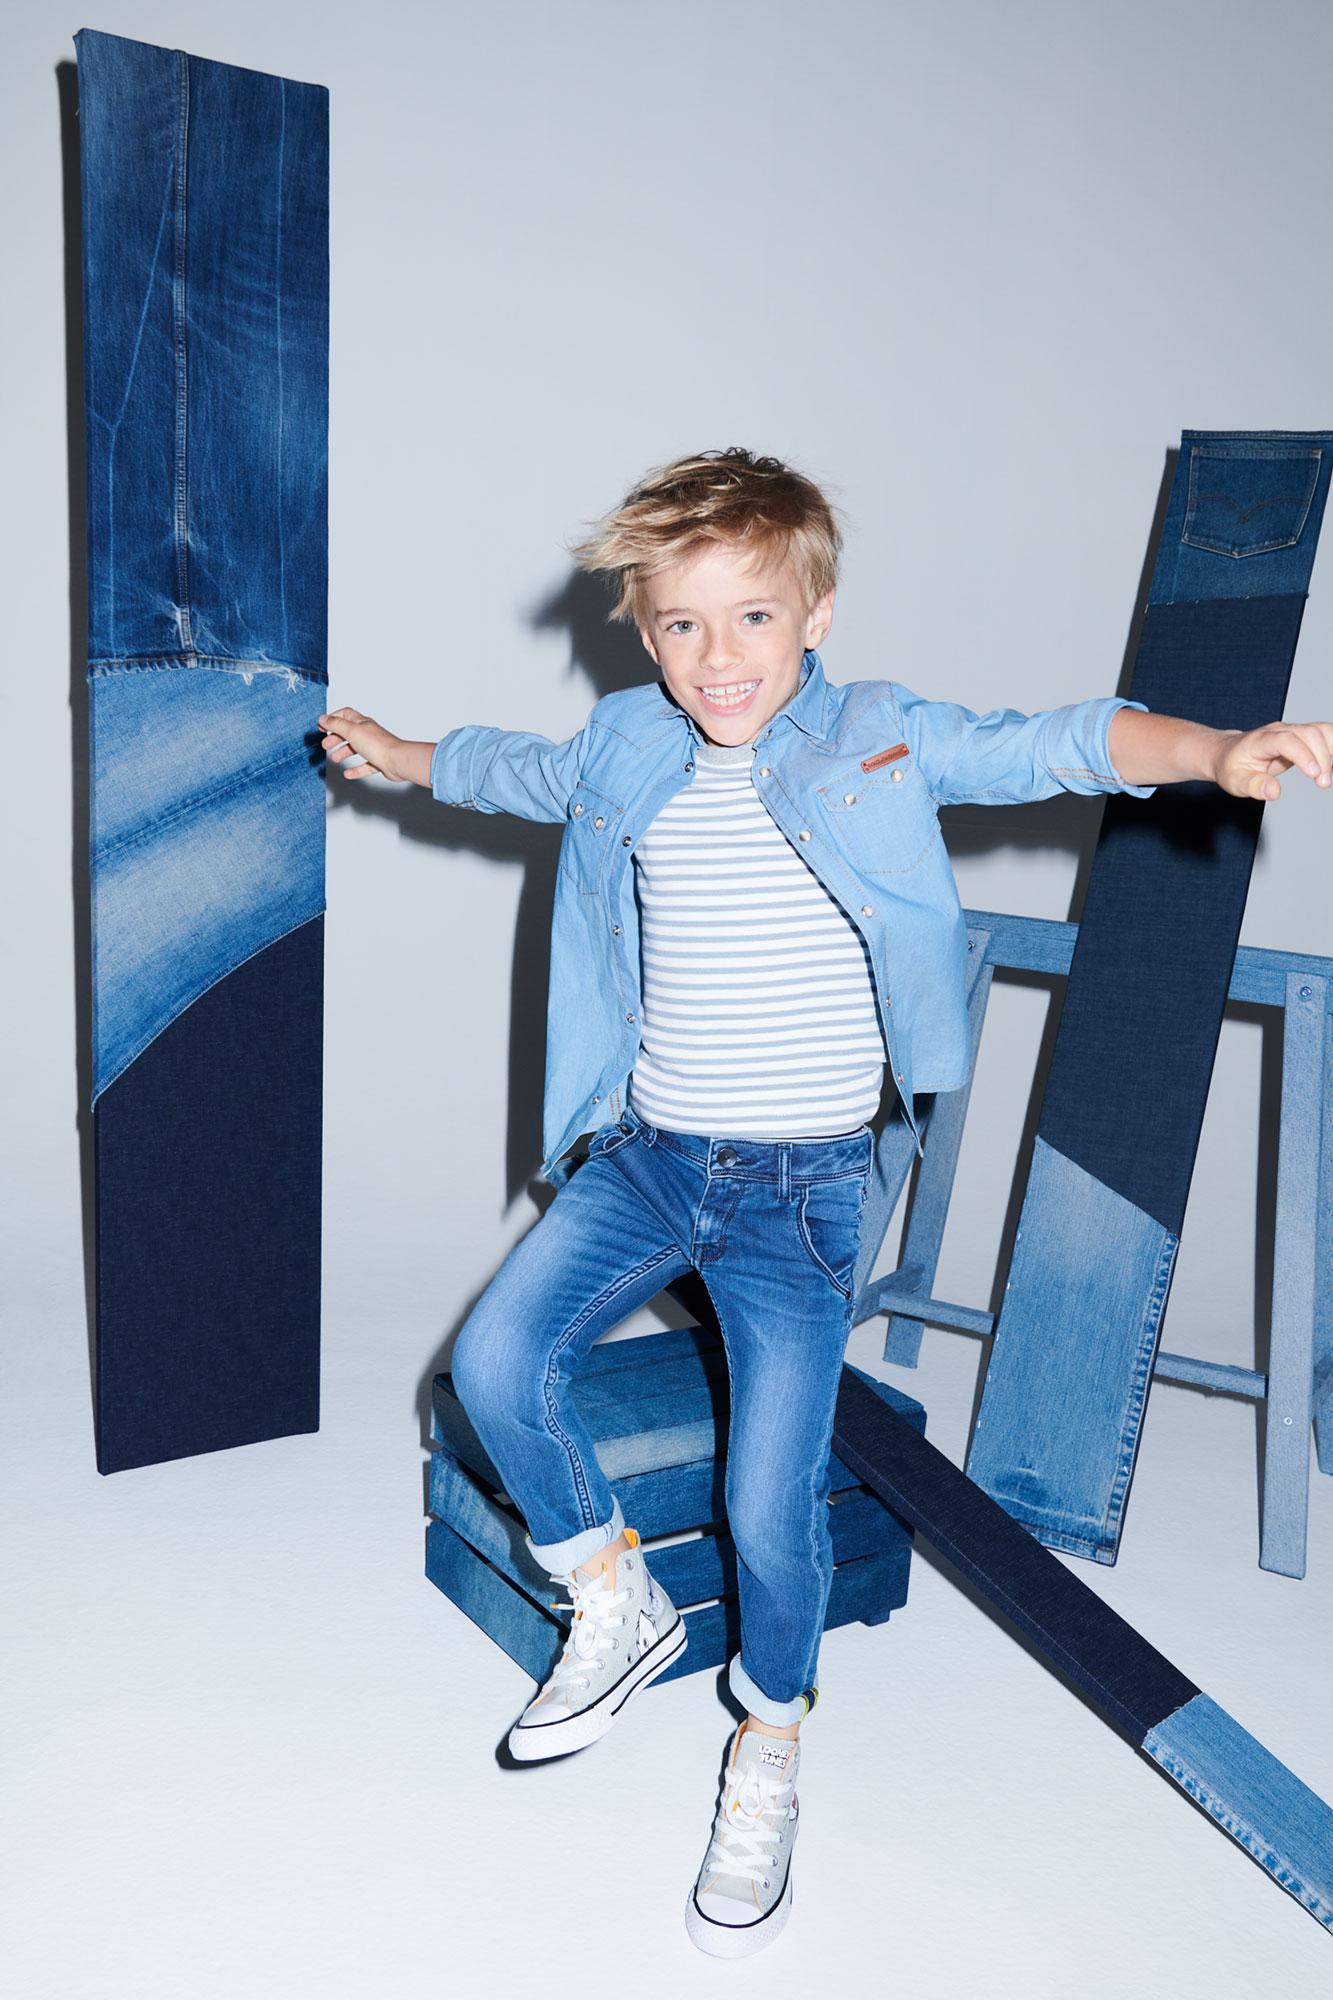 Yoox Kids 2018 | Marco Tassinari | Yoox | Numerique Retouch Photo Retouching Studio